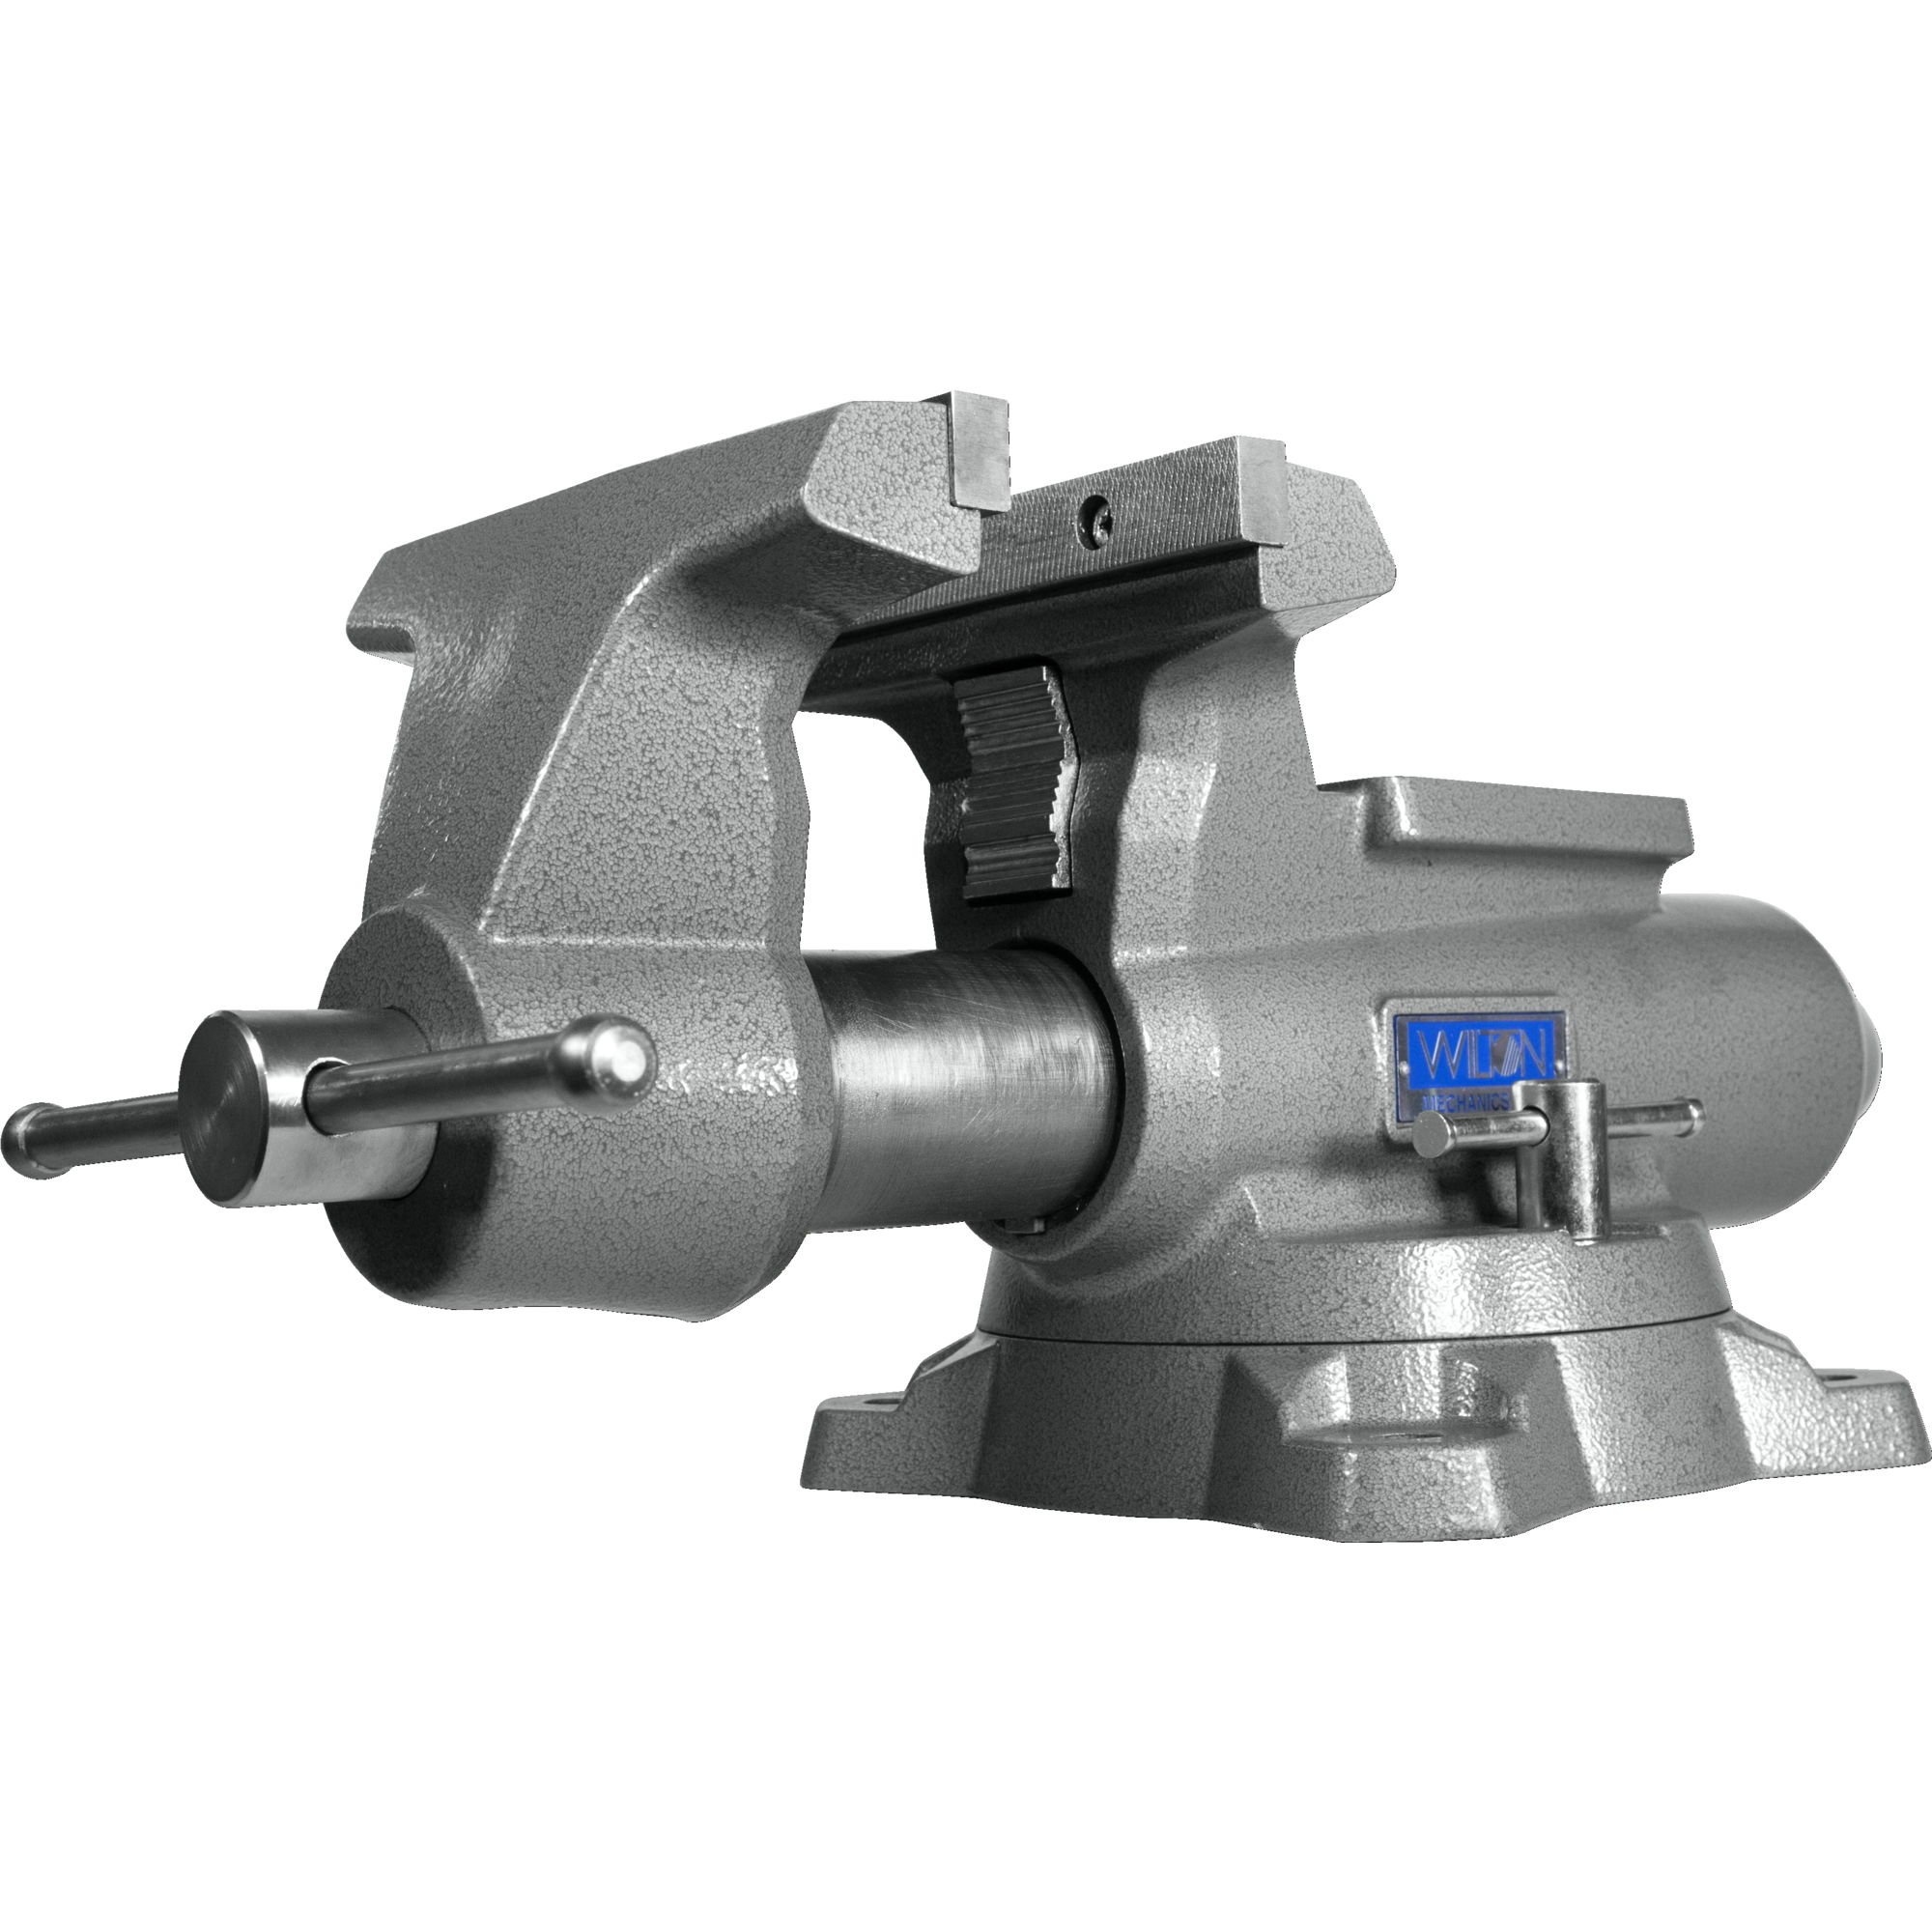 Wilton Tools 28813 880M Wilton Mechanics Pro Vise 8''